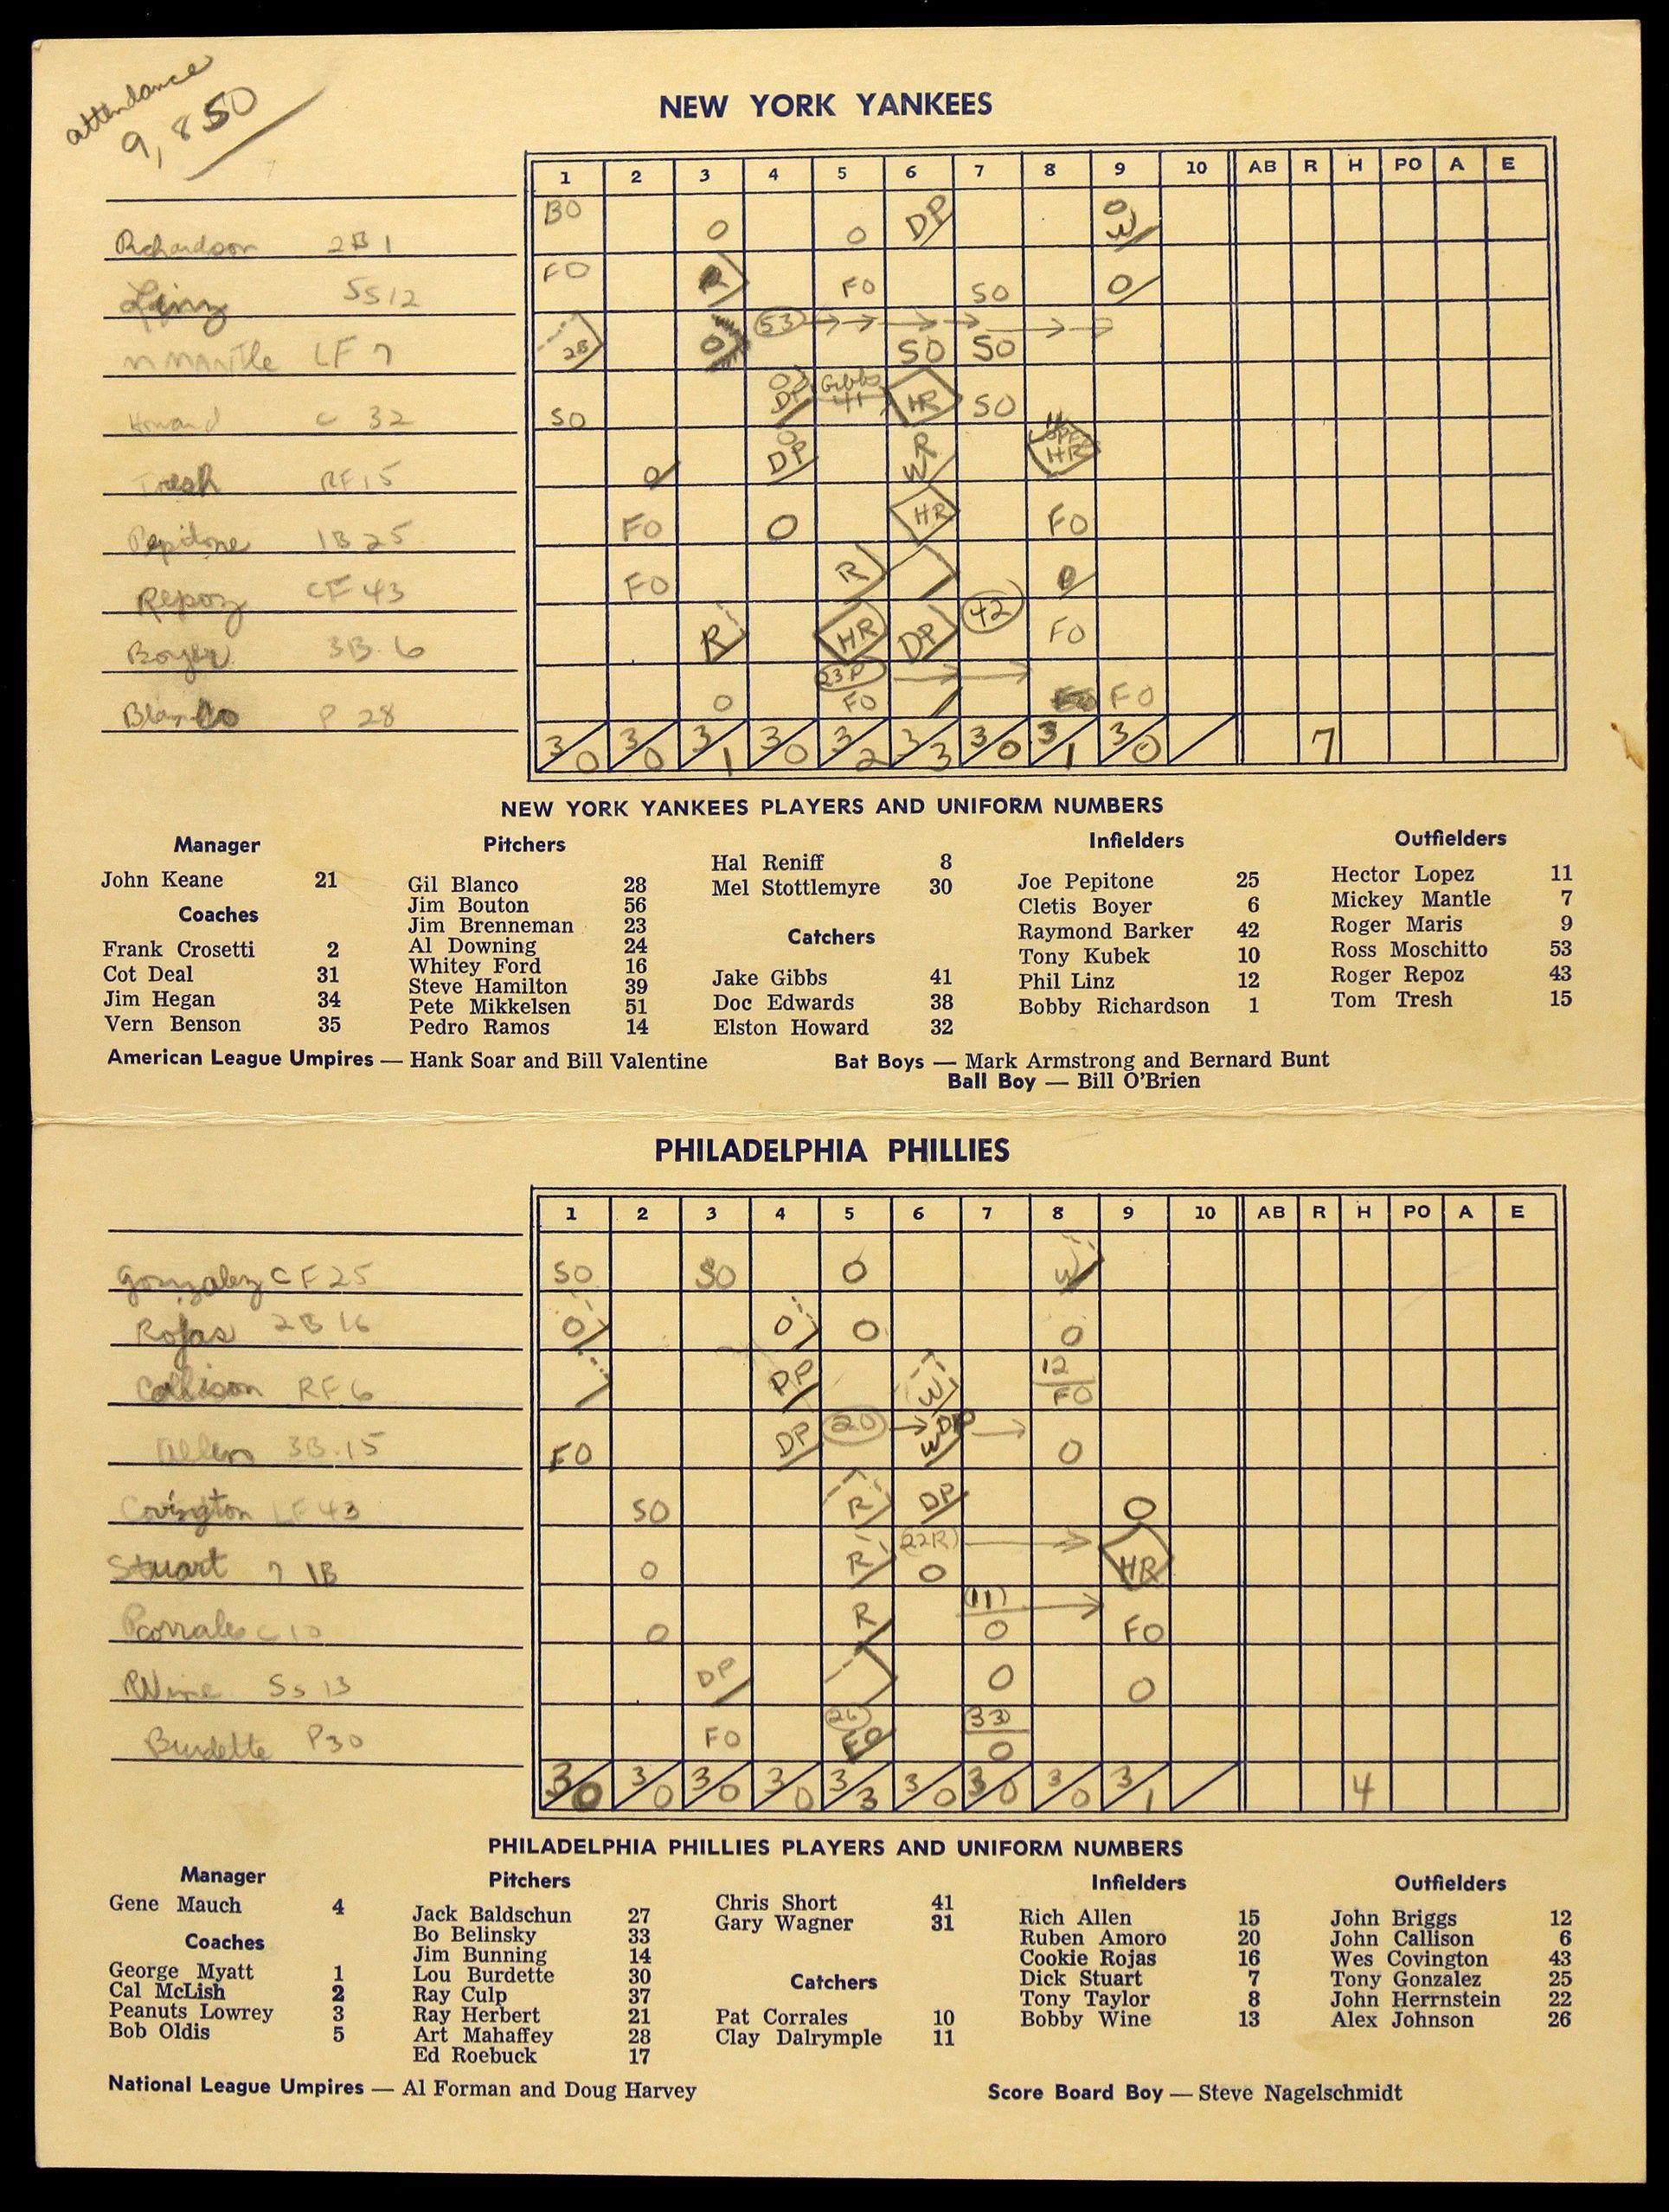 1965 Hall of Fame Game Scorecard